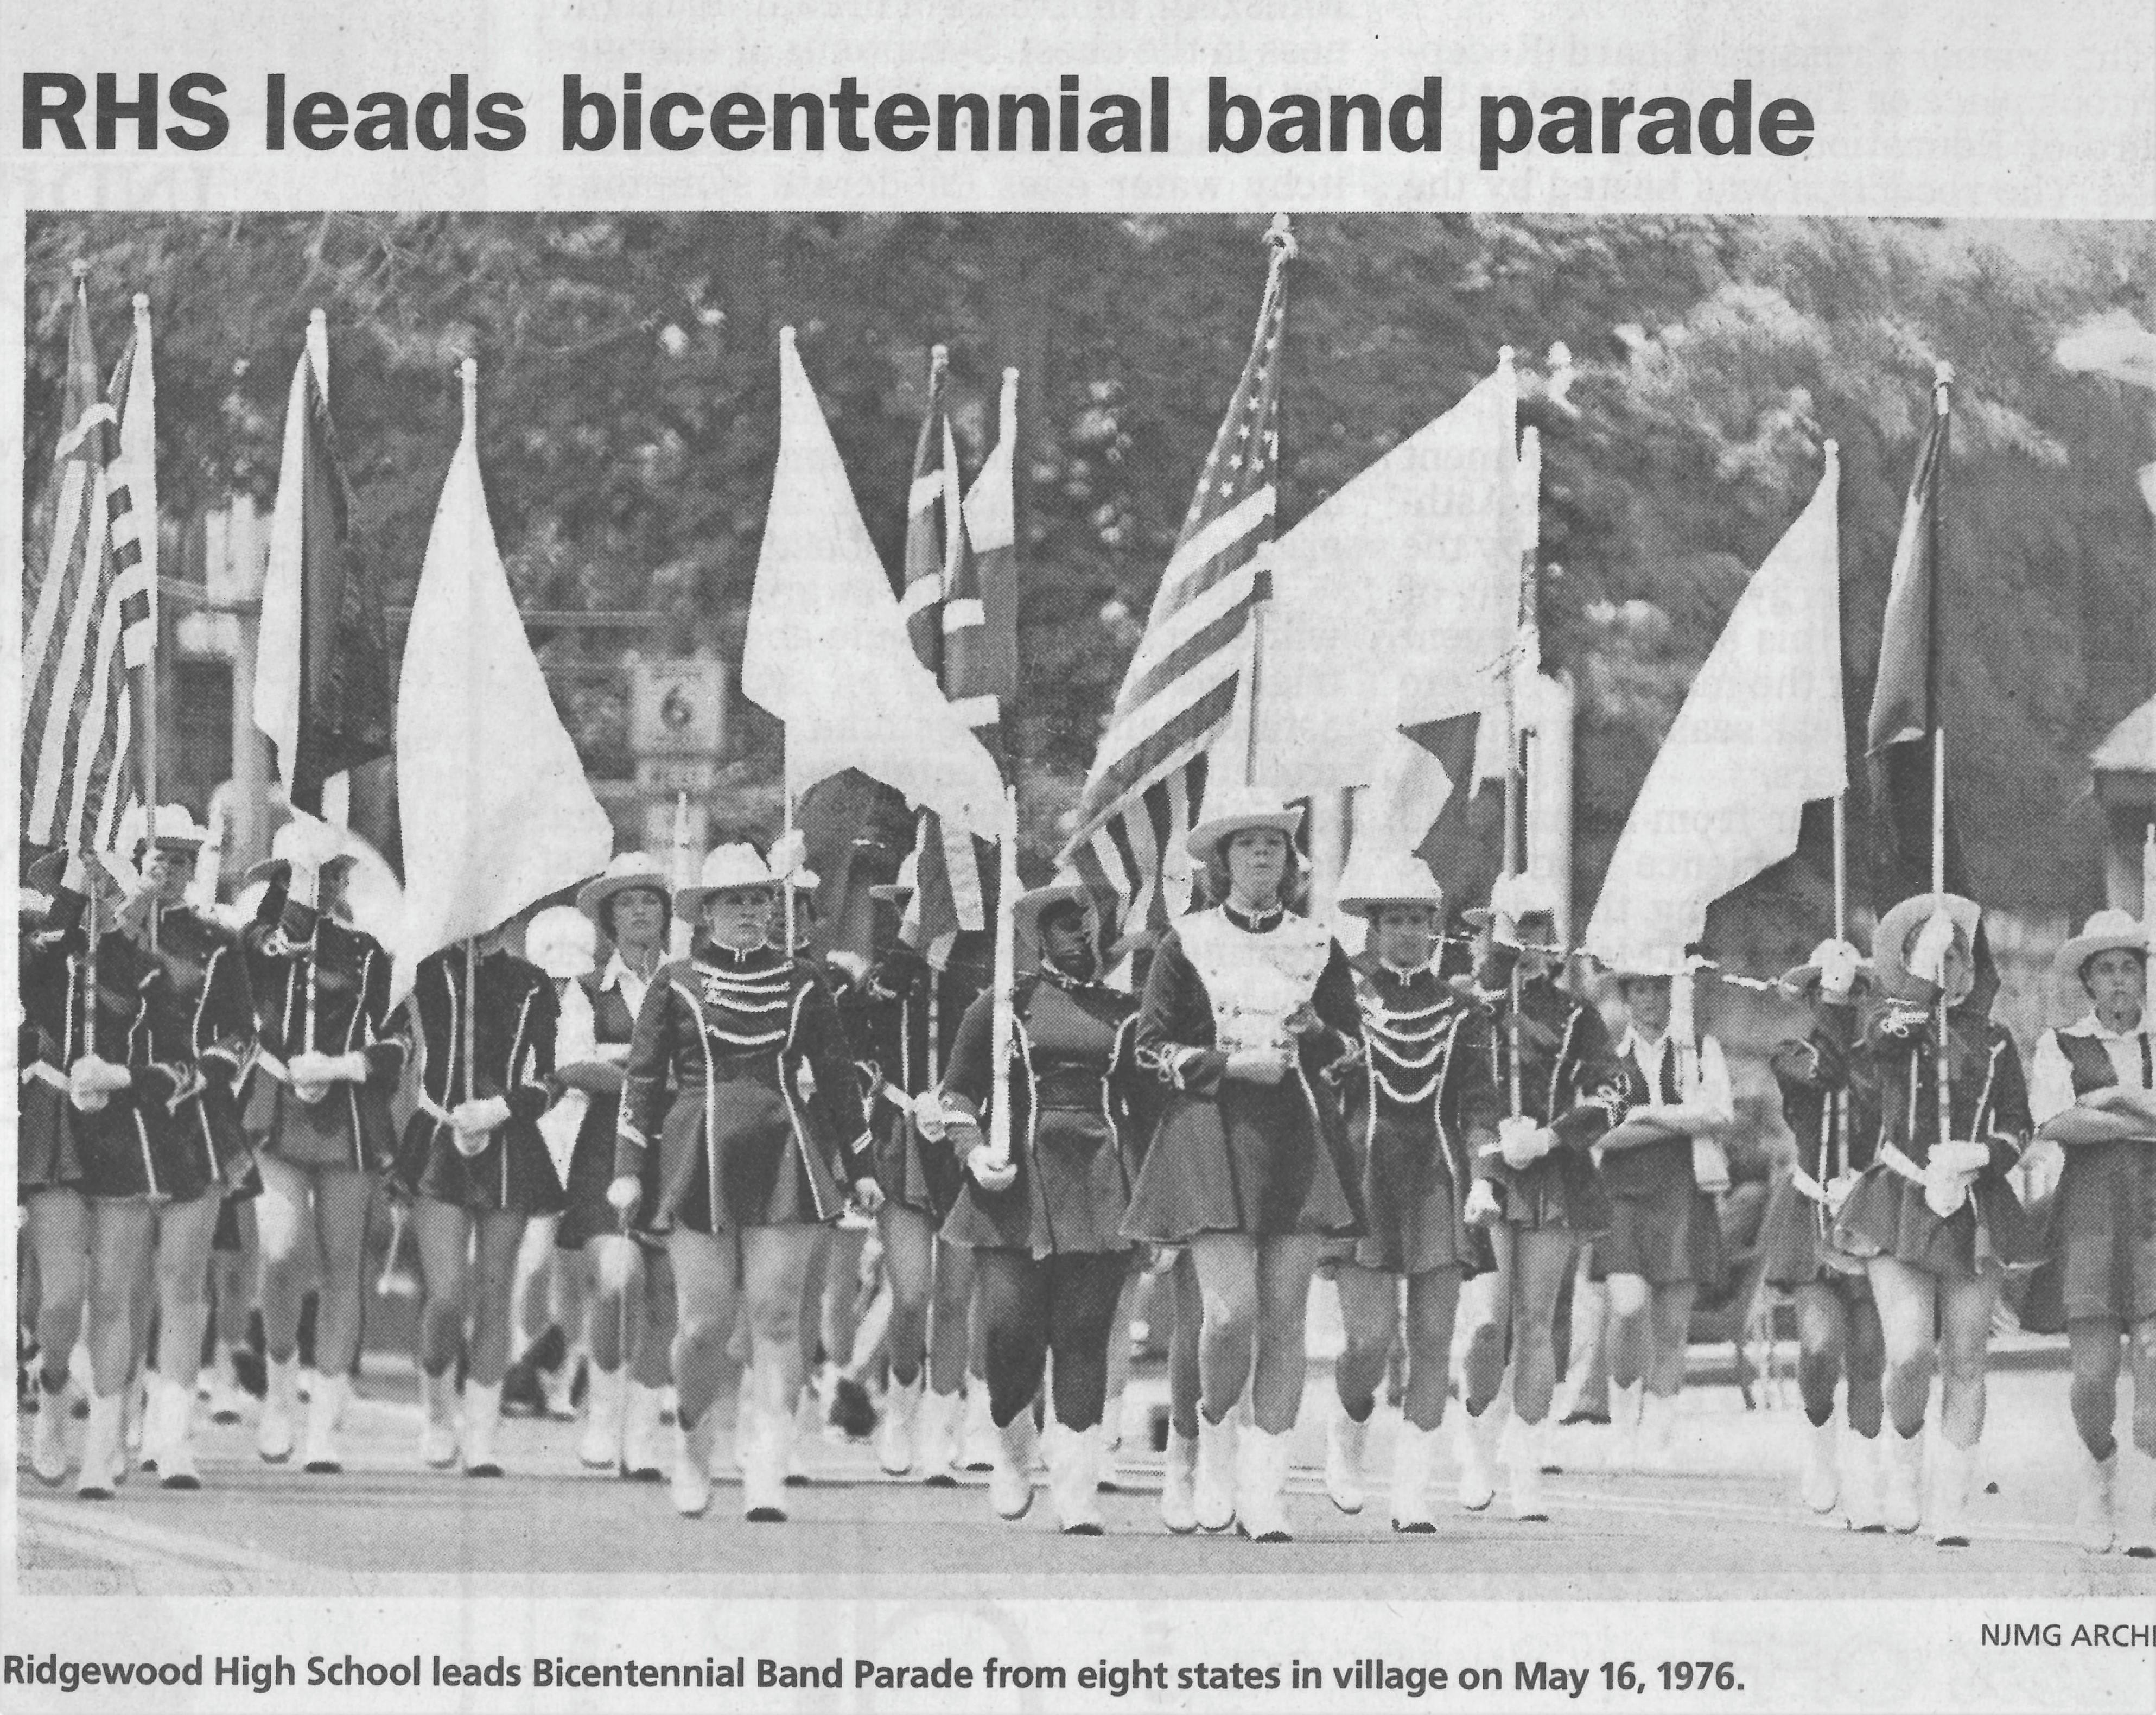 RHSMB Bicentennial Parade 1976